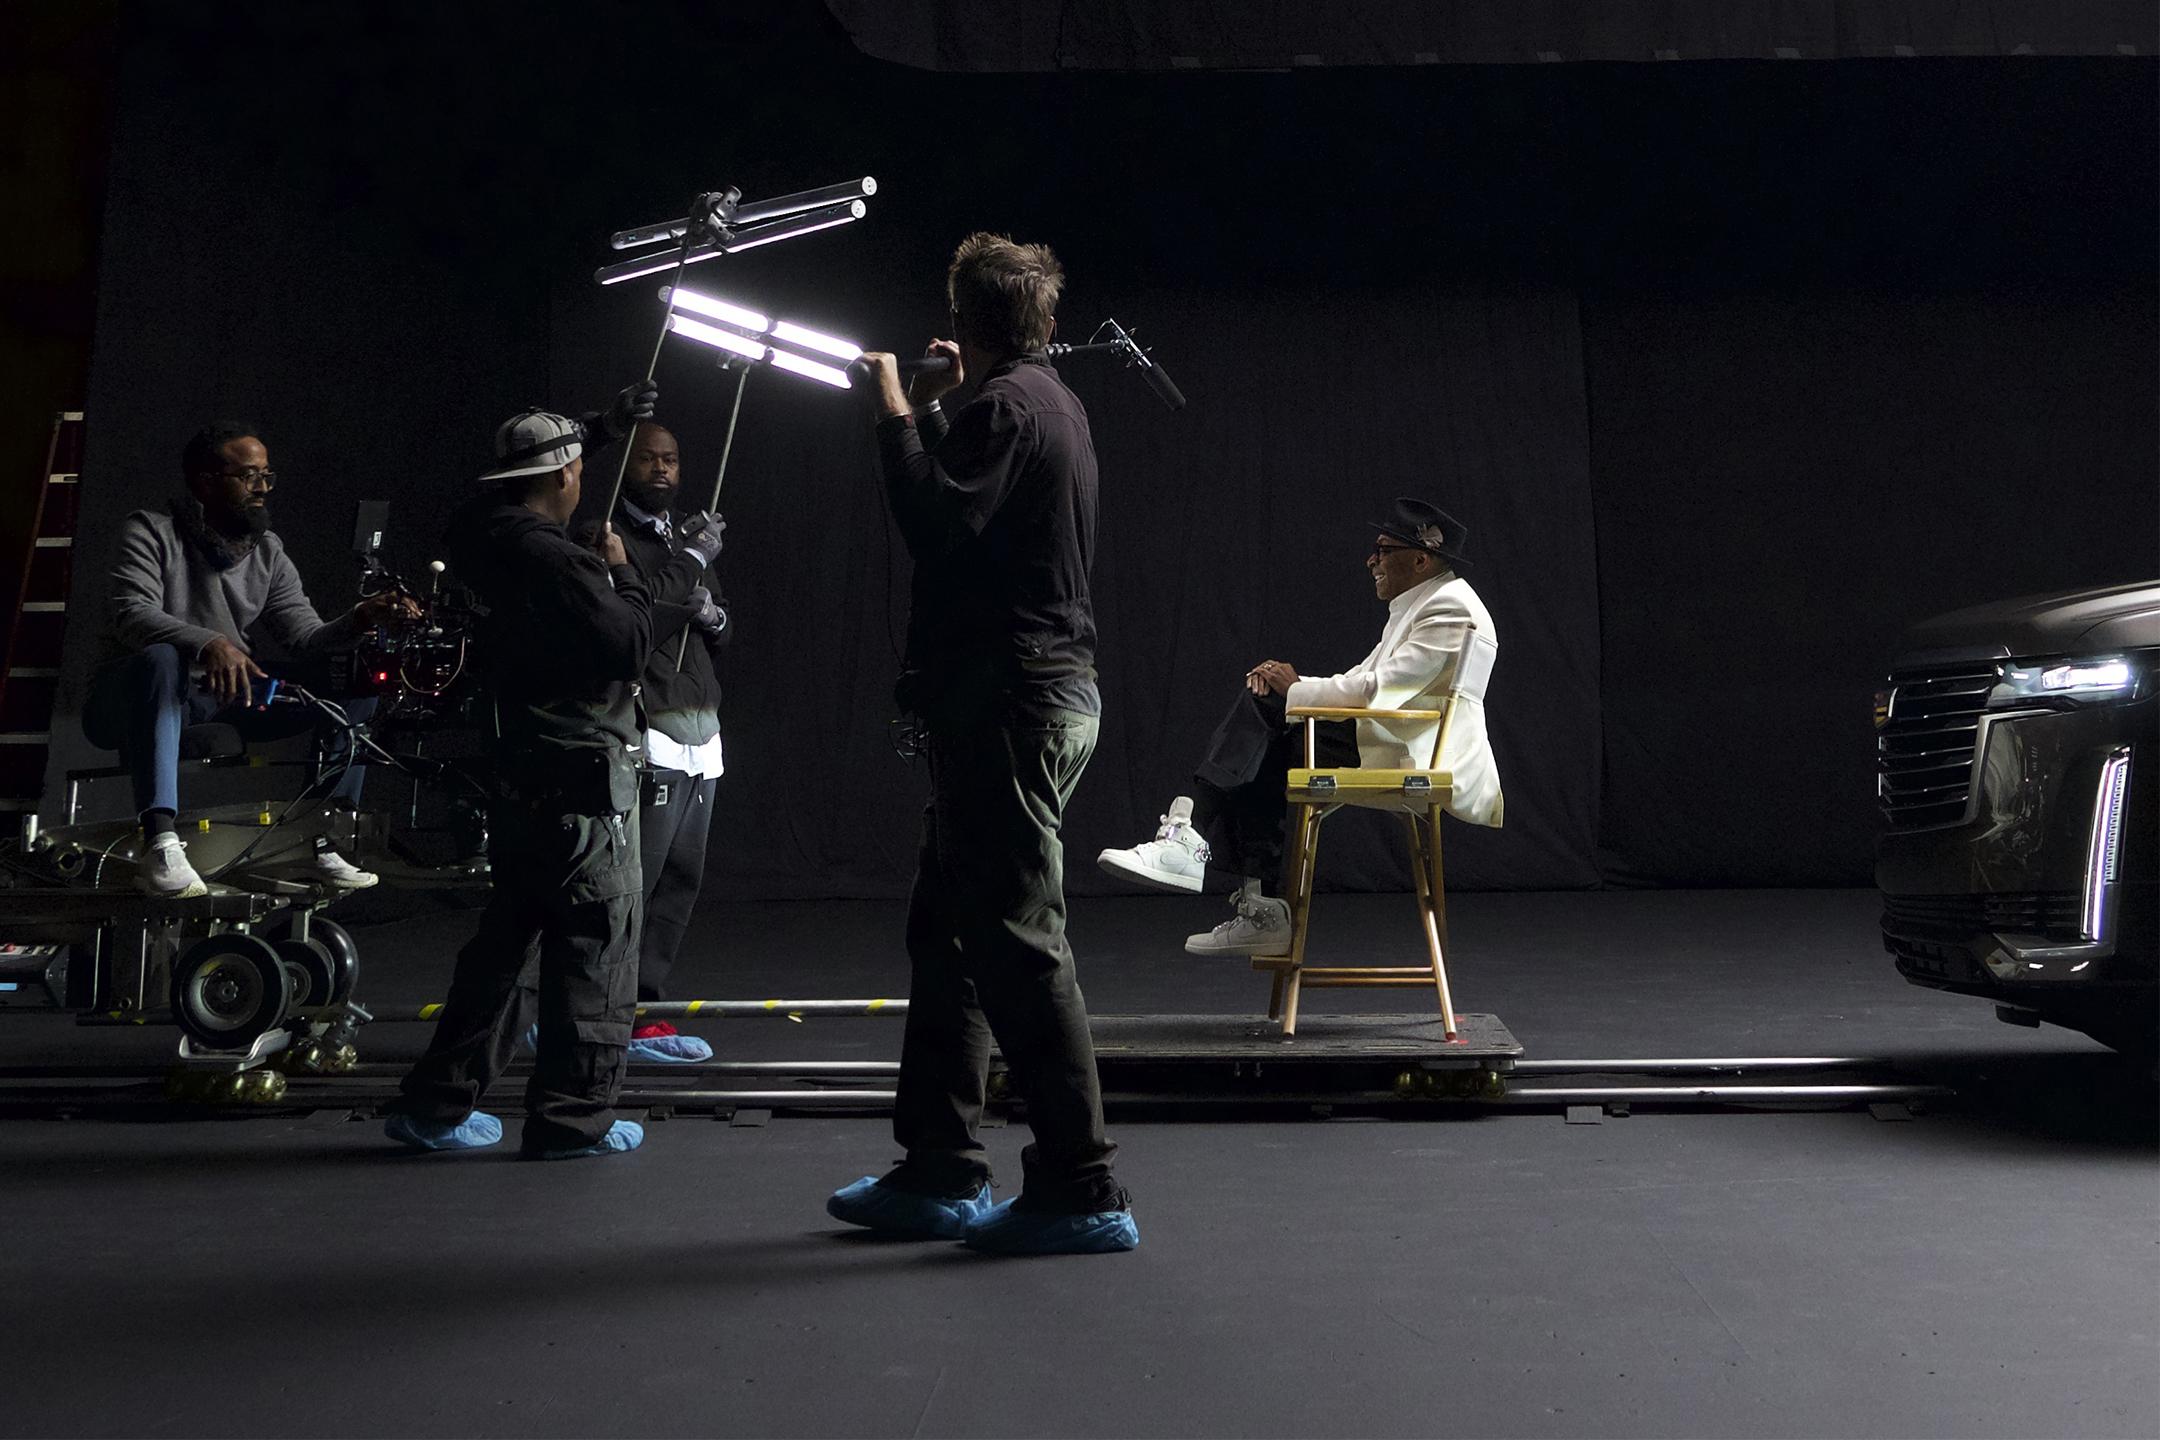 Oscar-winning auteur Spike Lee will introduce the 2021 Cadillac